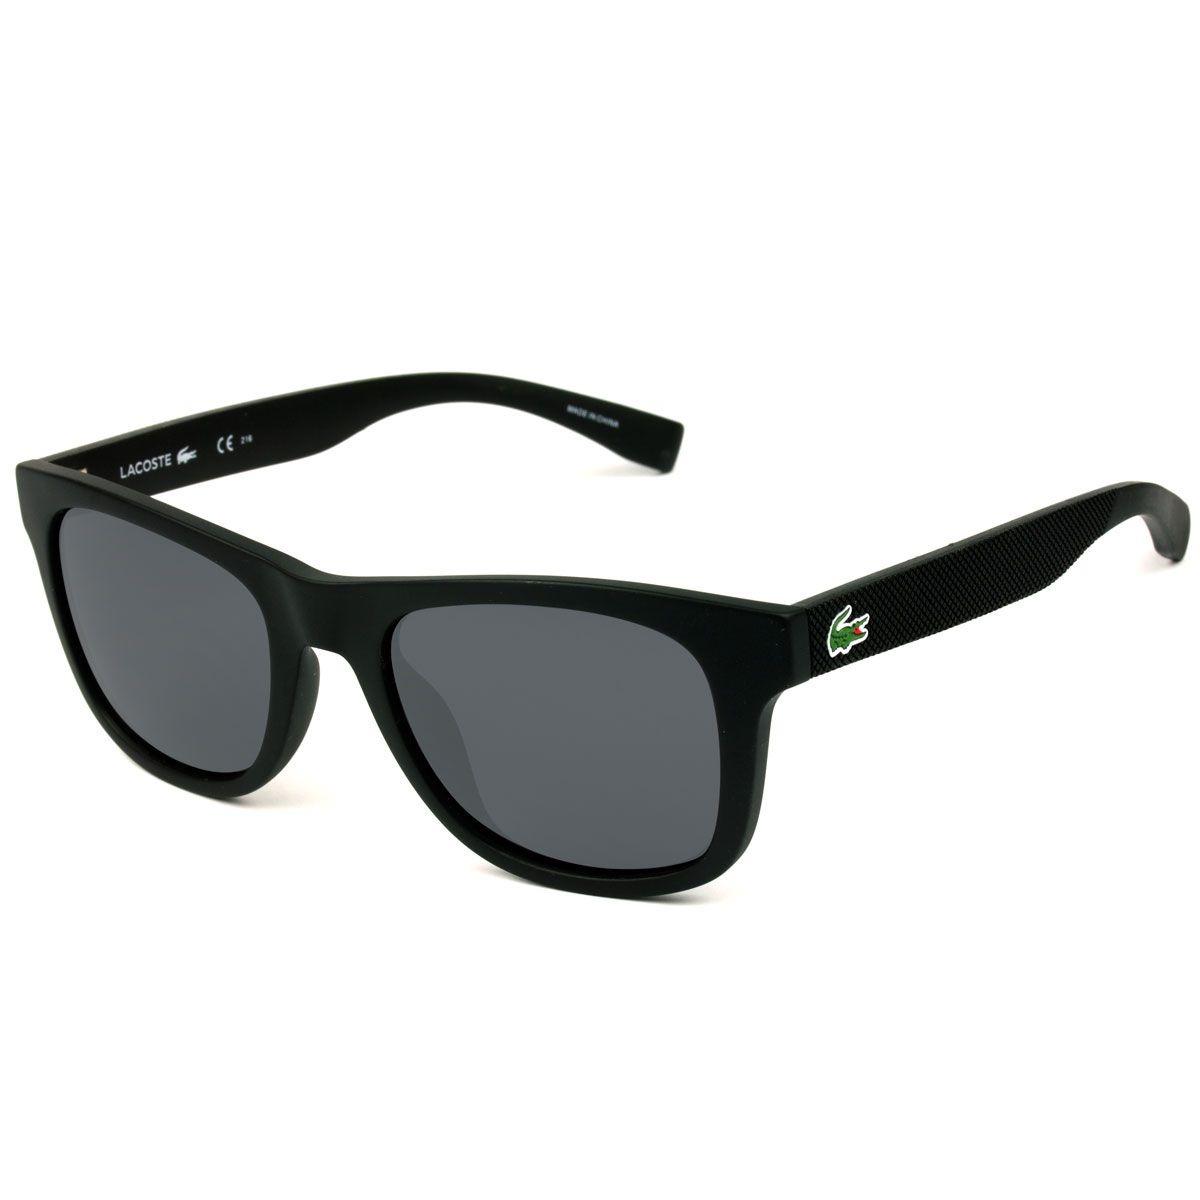 355407b0d5c0c óculos de sol masculino lacoste l790s 001. Carregando zoom.